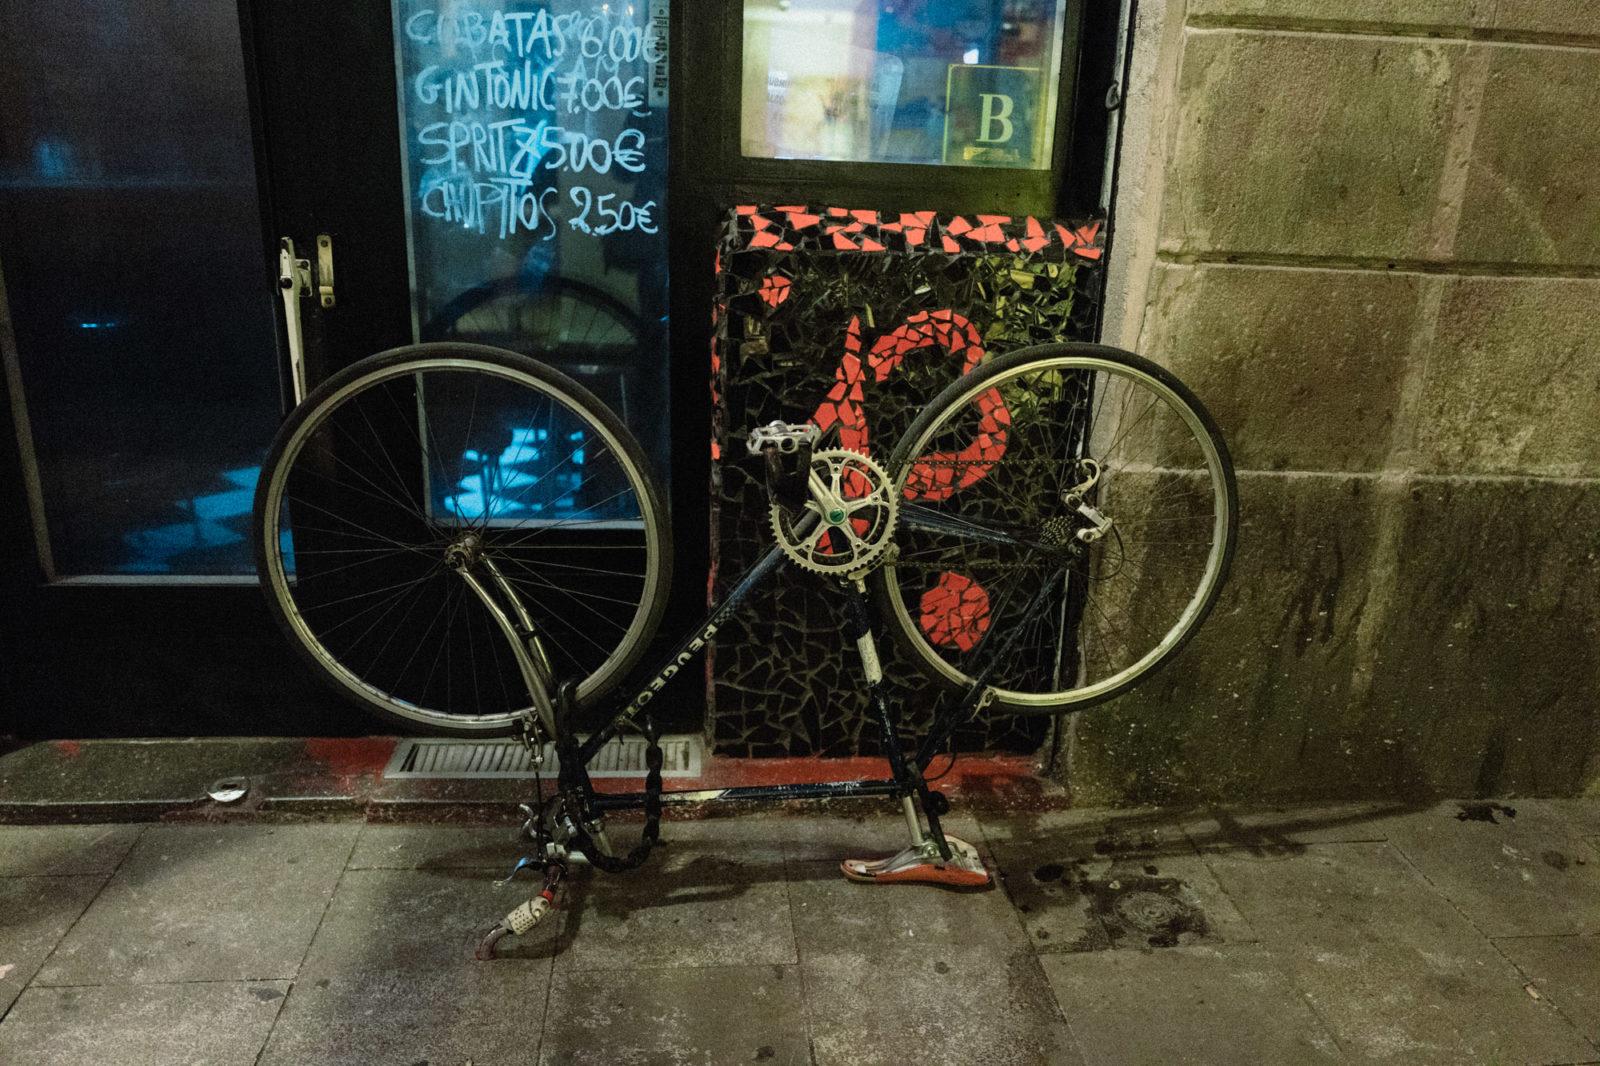 Barcelona Street-1090668